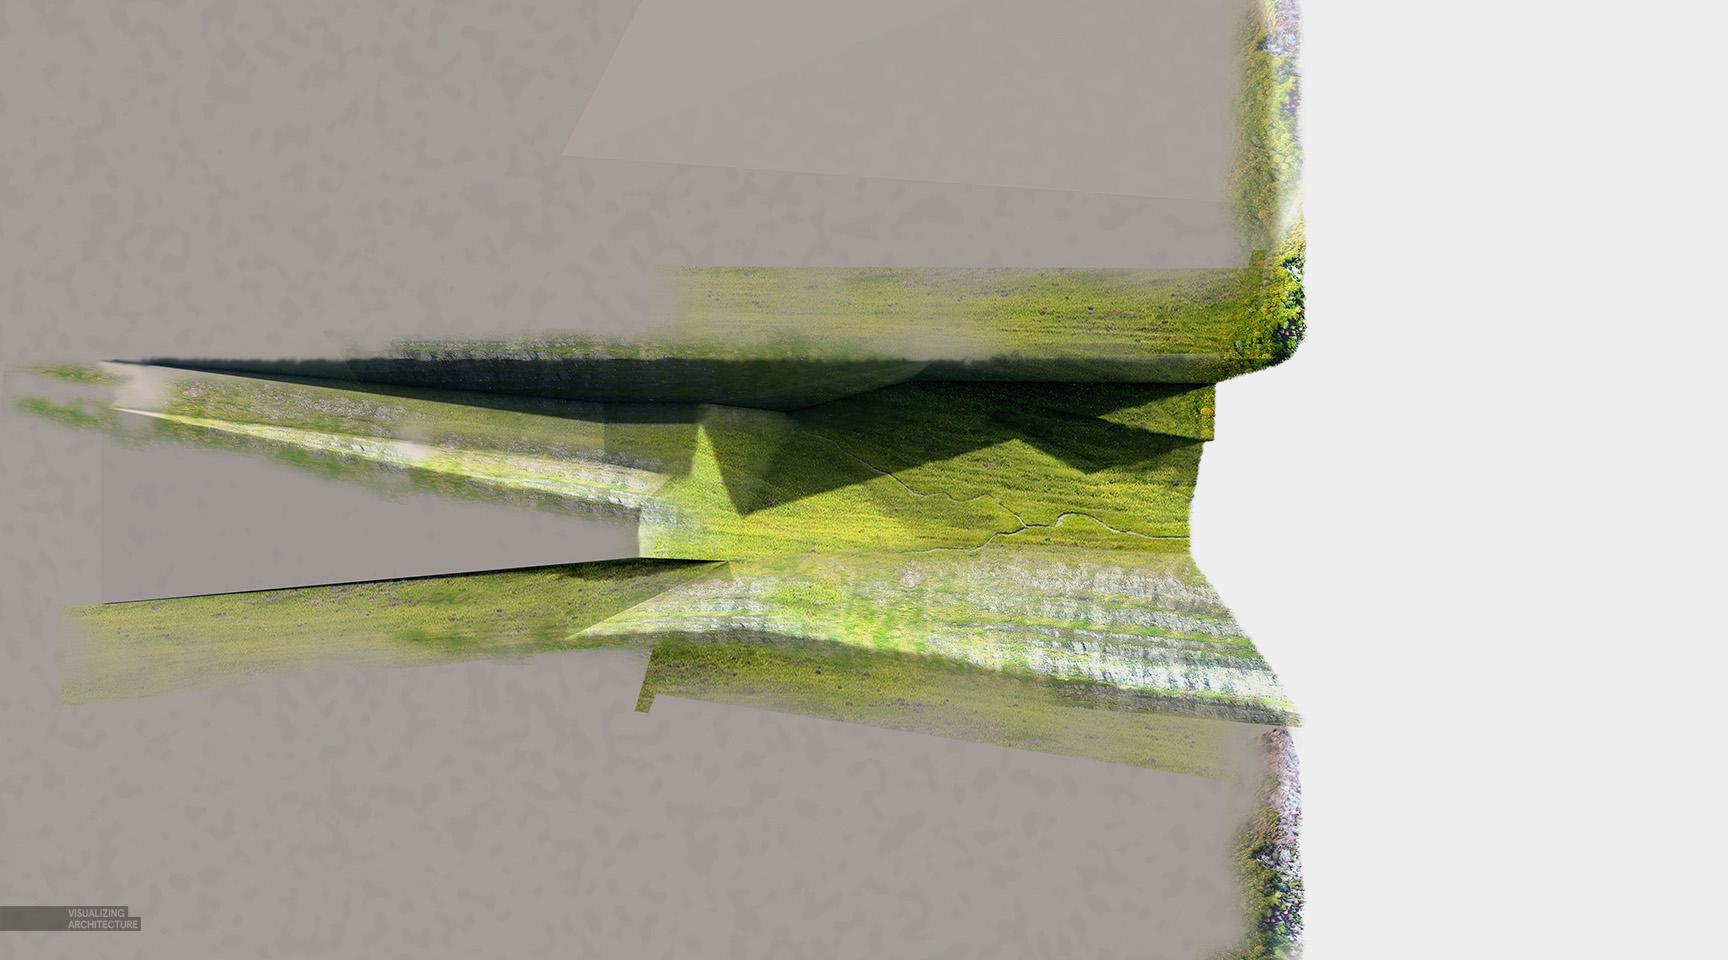 cliff_diagram_5_GrassStart2